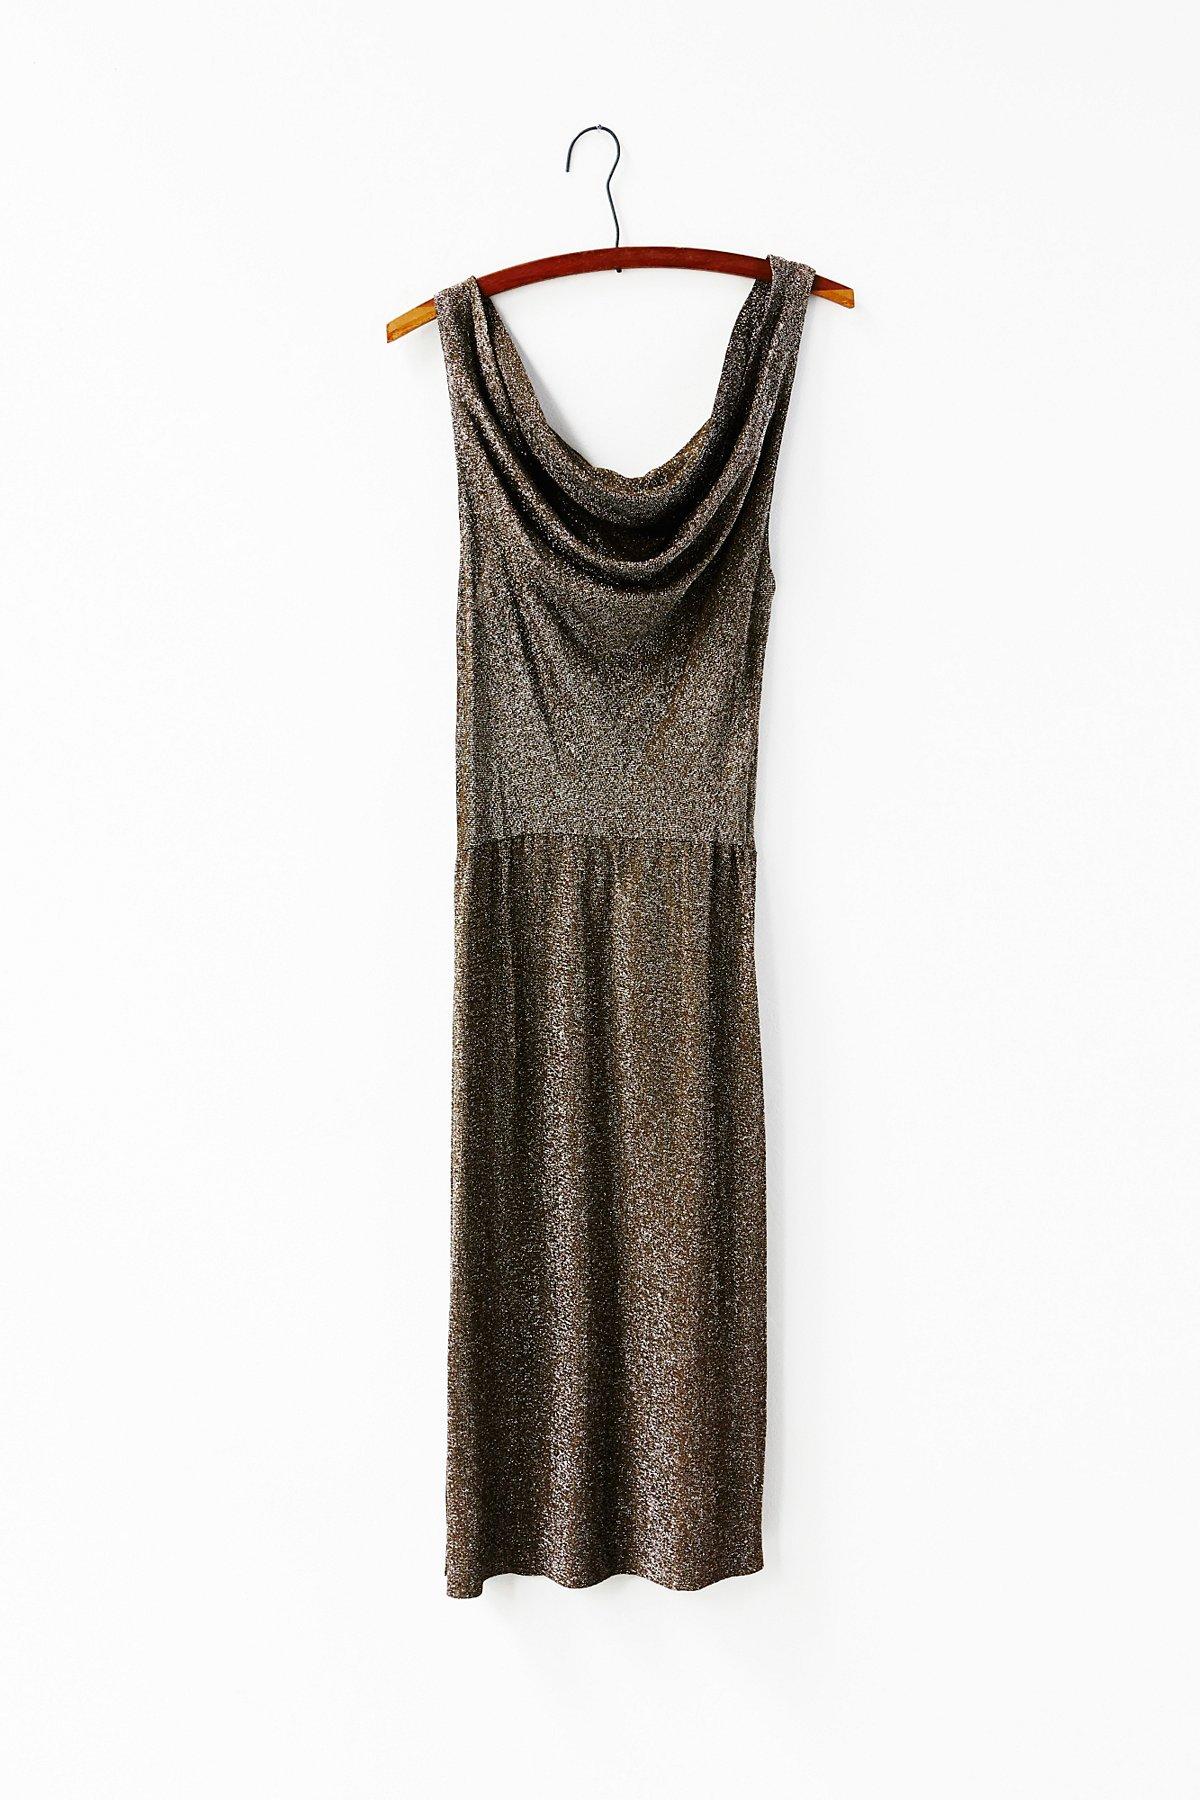 Vintage 1980s Metallic Dress